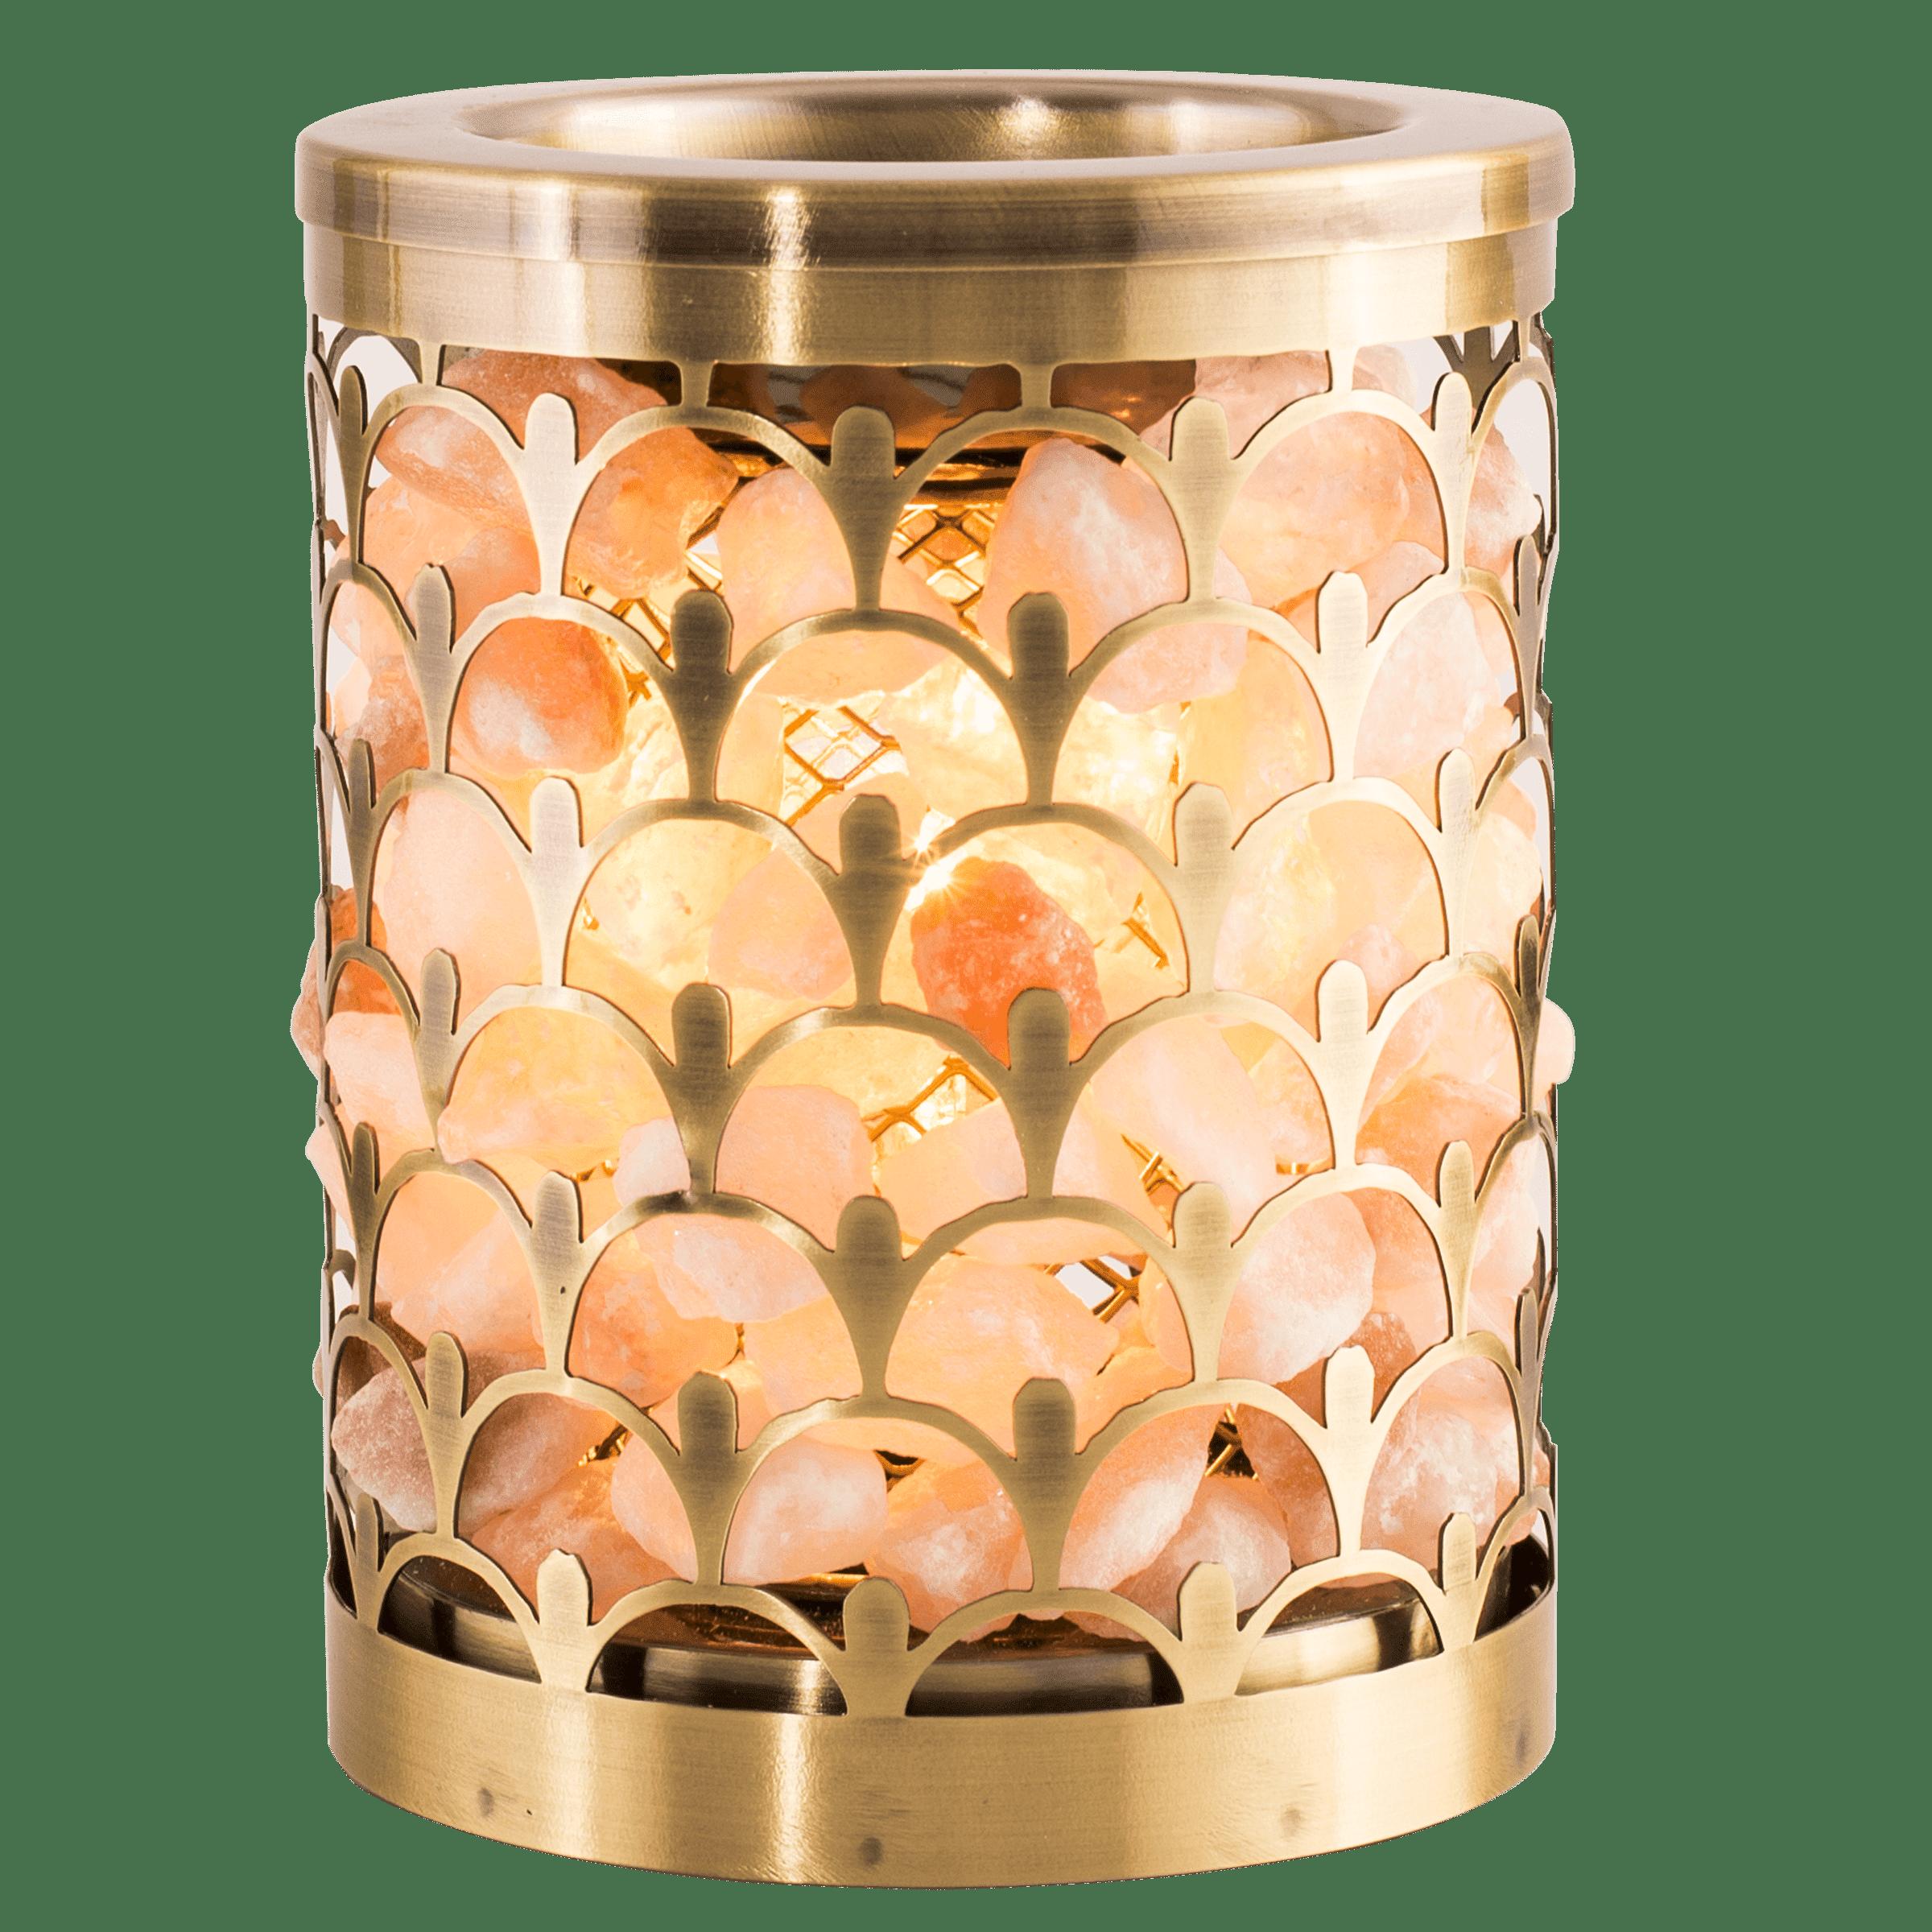 ScentSationals Sienna Full-Size Himalayan Salt Wax Warmer